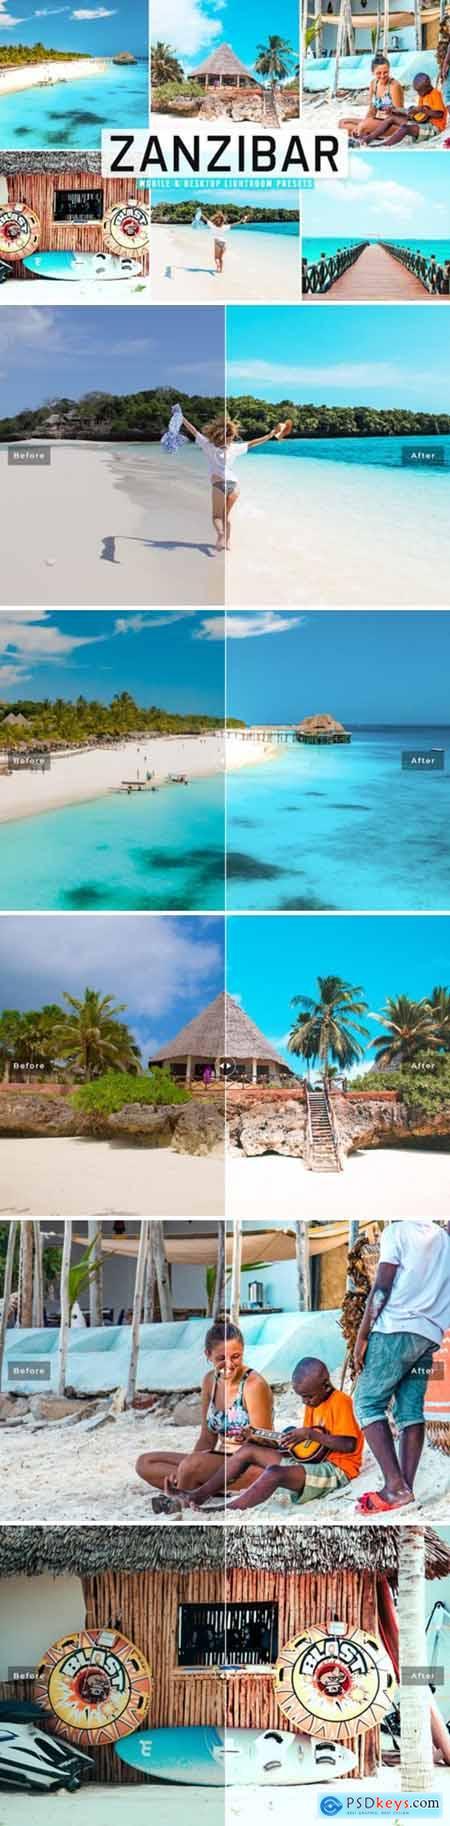 Zanzibar Pro Lightroom Presets 6576750